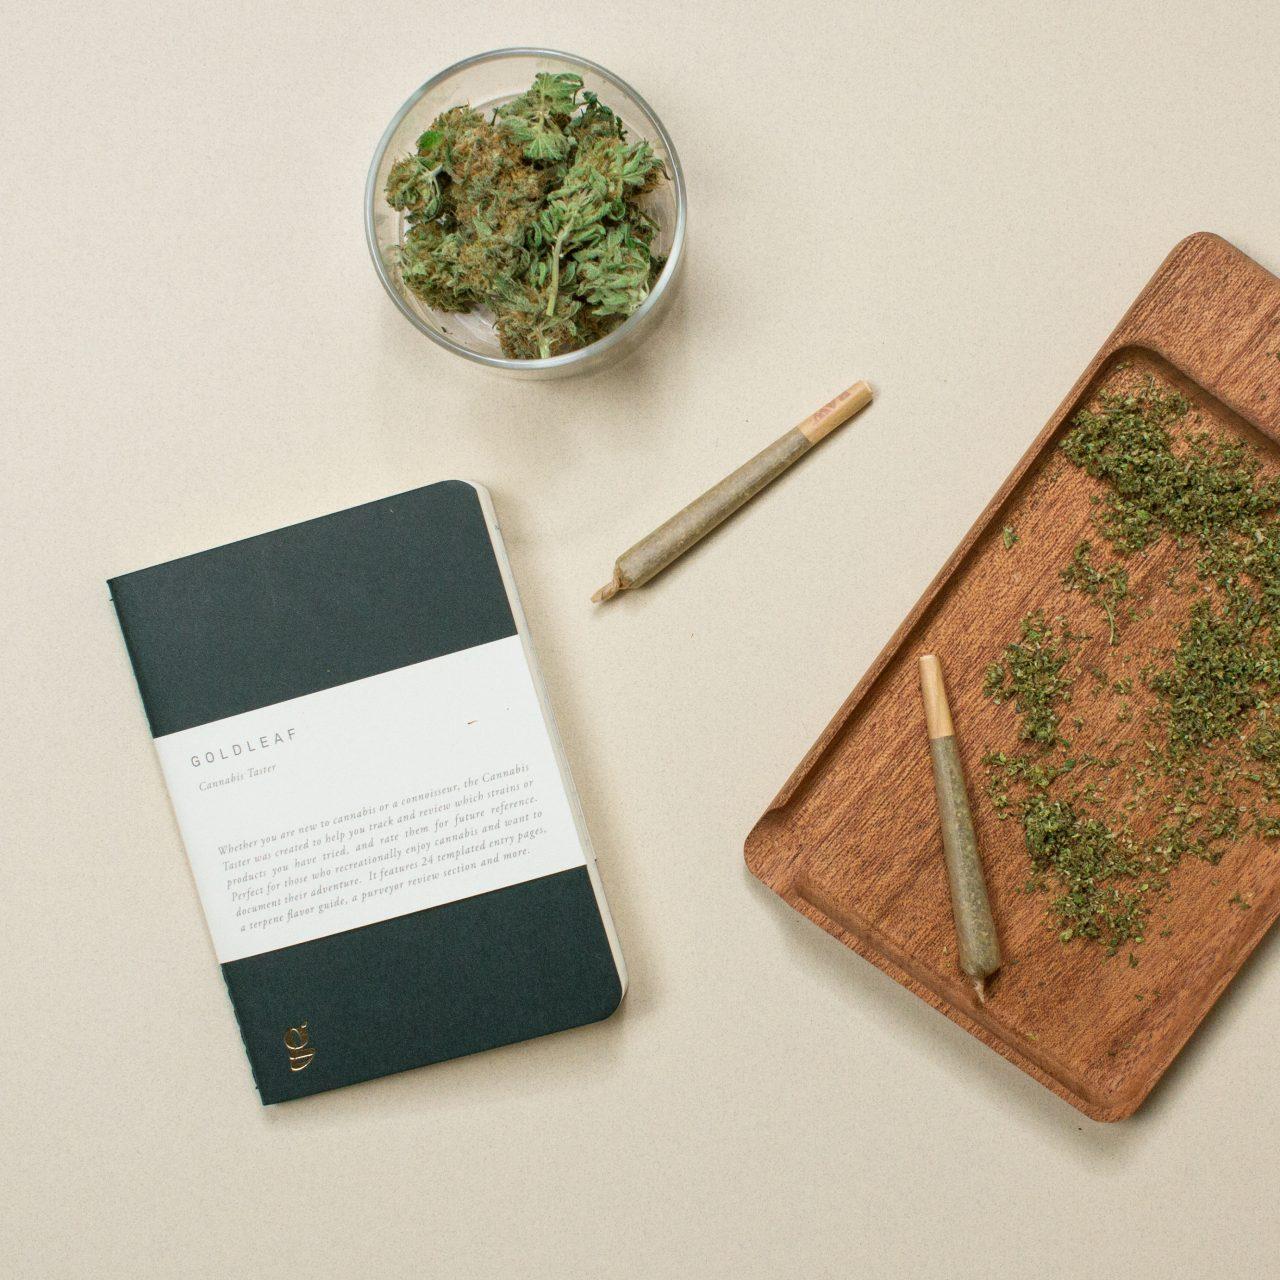 Goldleaf-Cannabis-Taster-Lifestyle-2-1280x1280.jpg